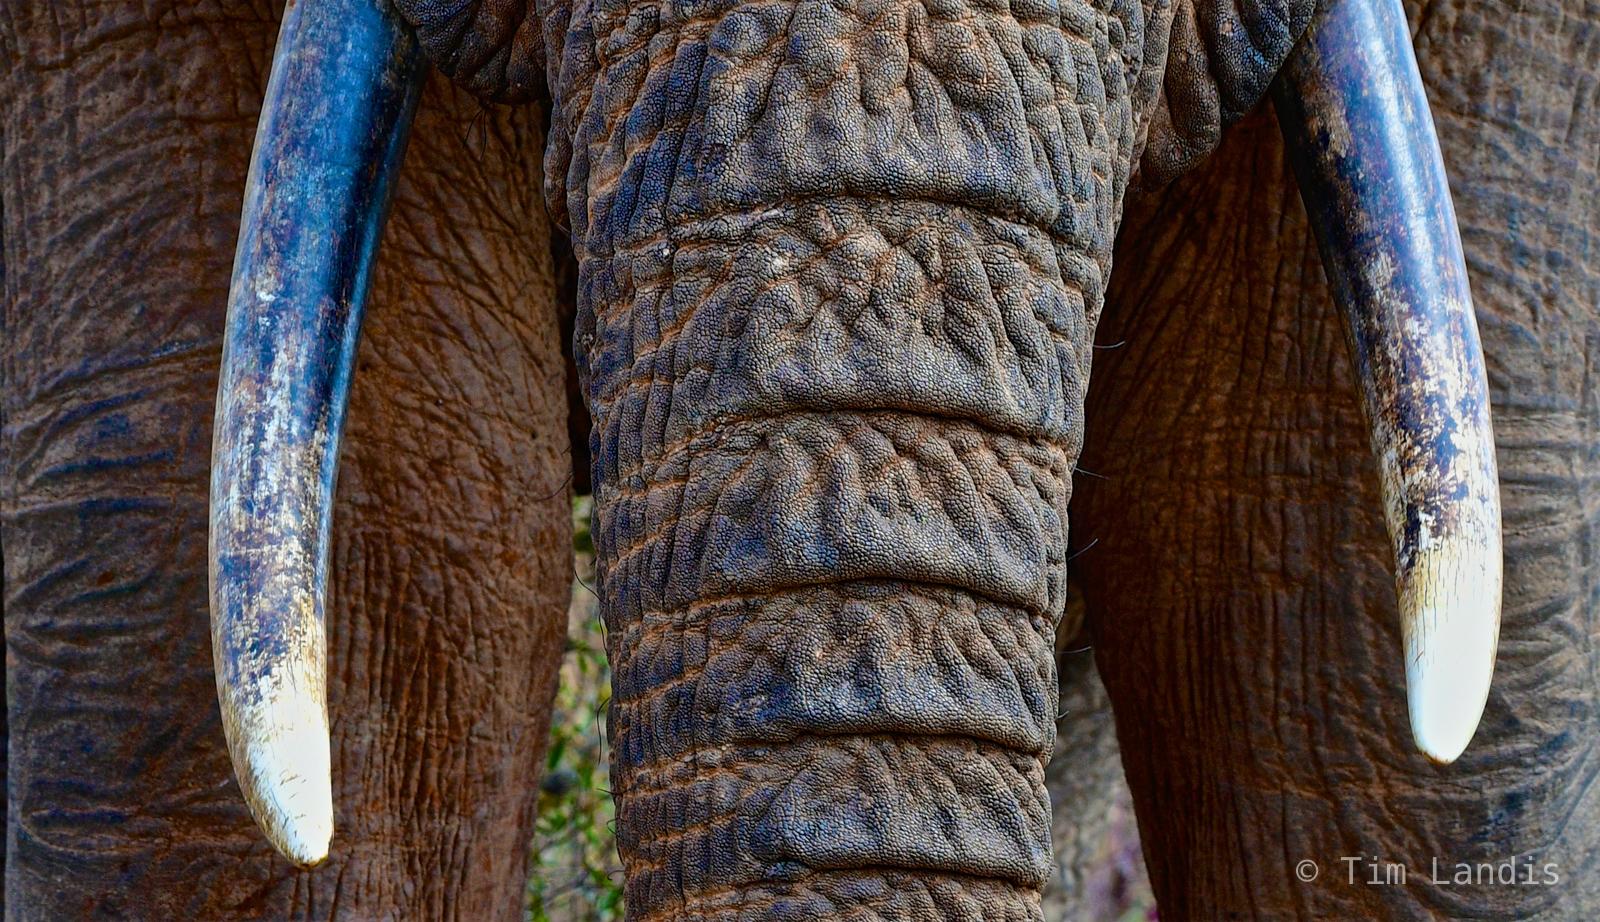 elephant close up, trunk and tusks, wrinkles, photo